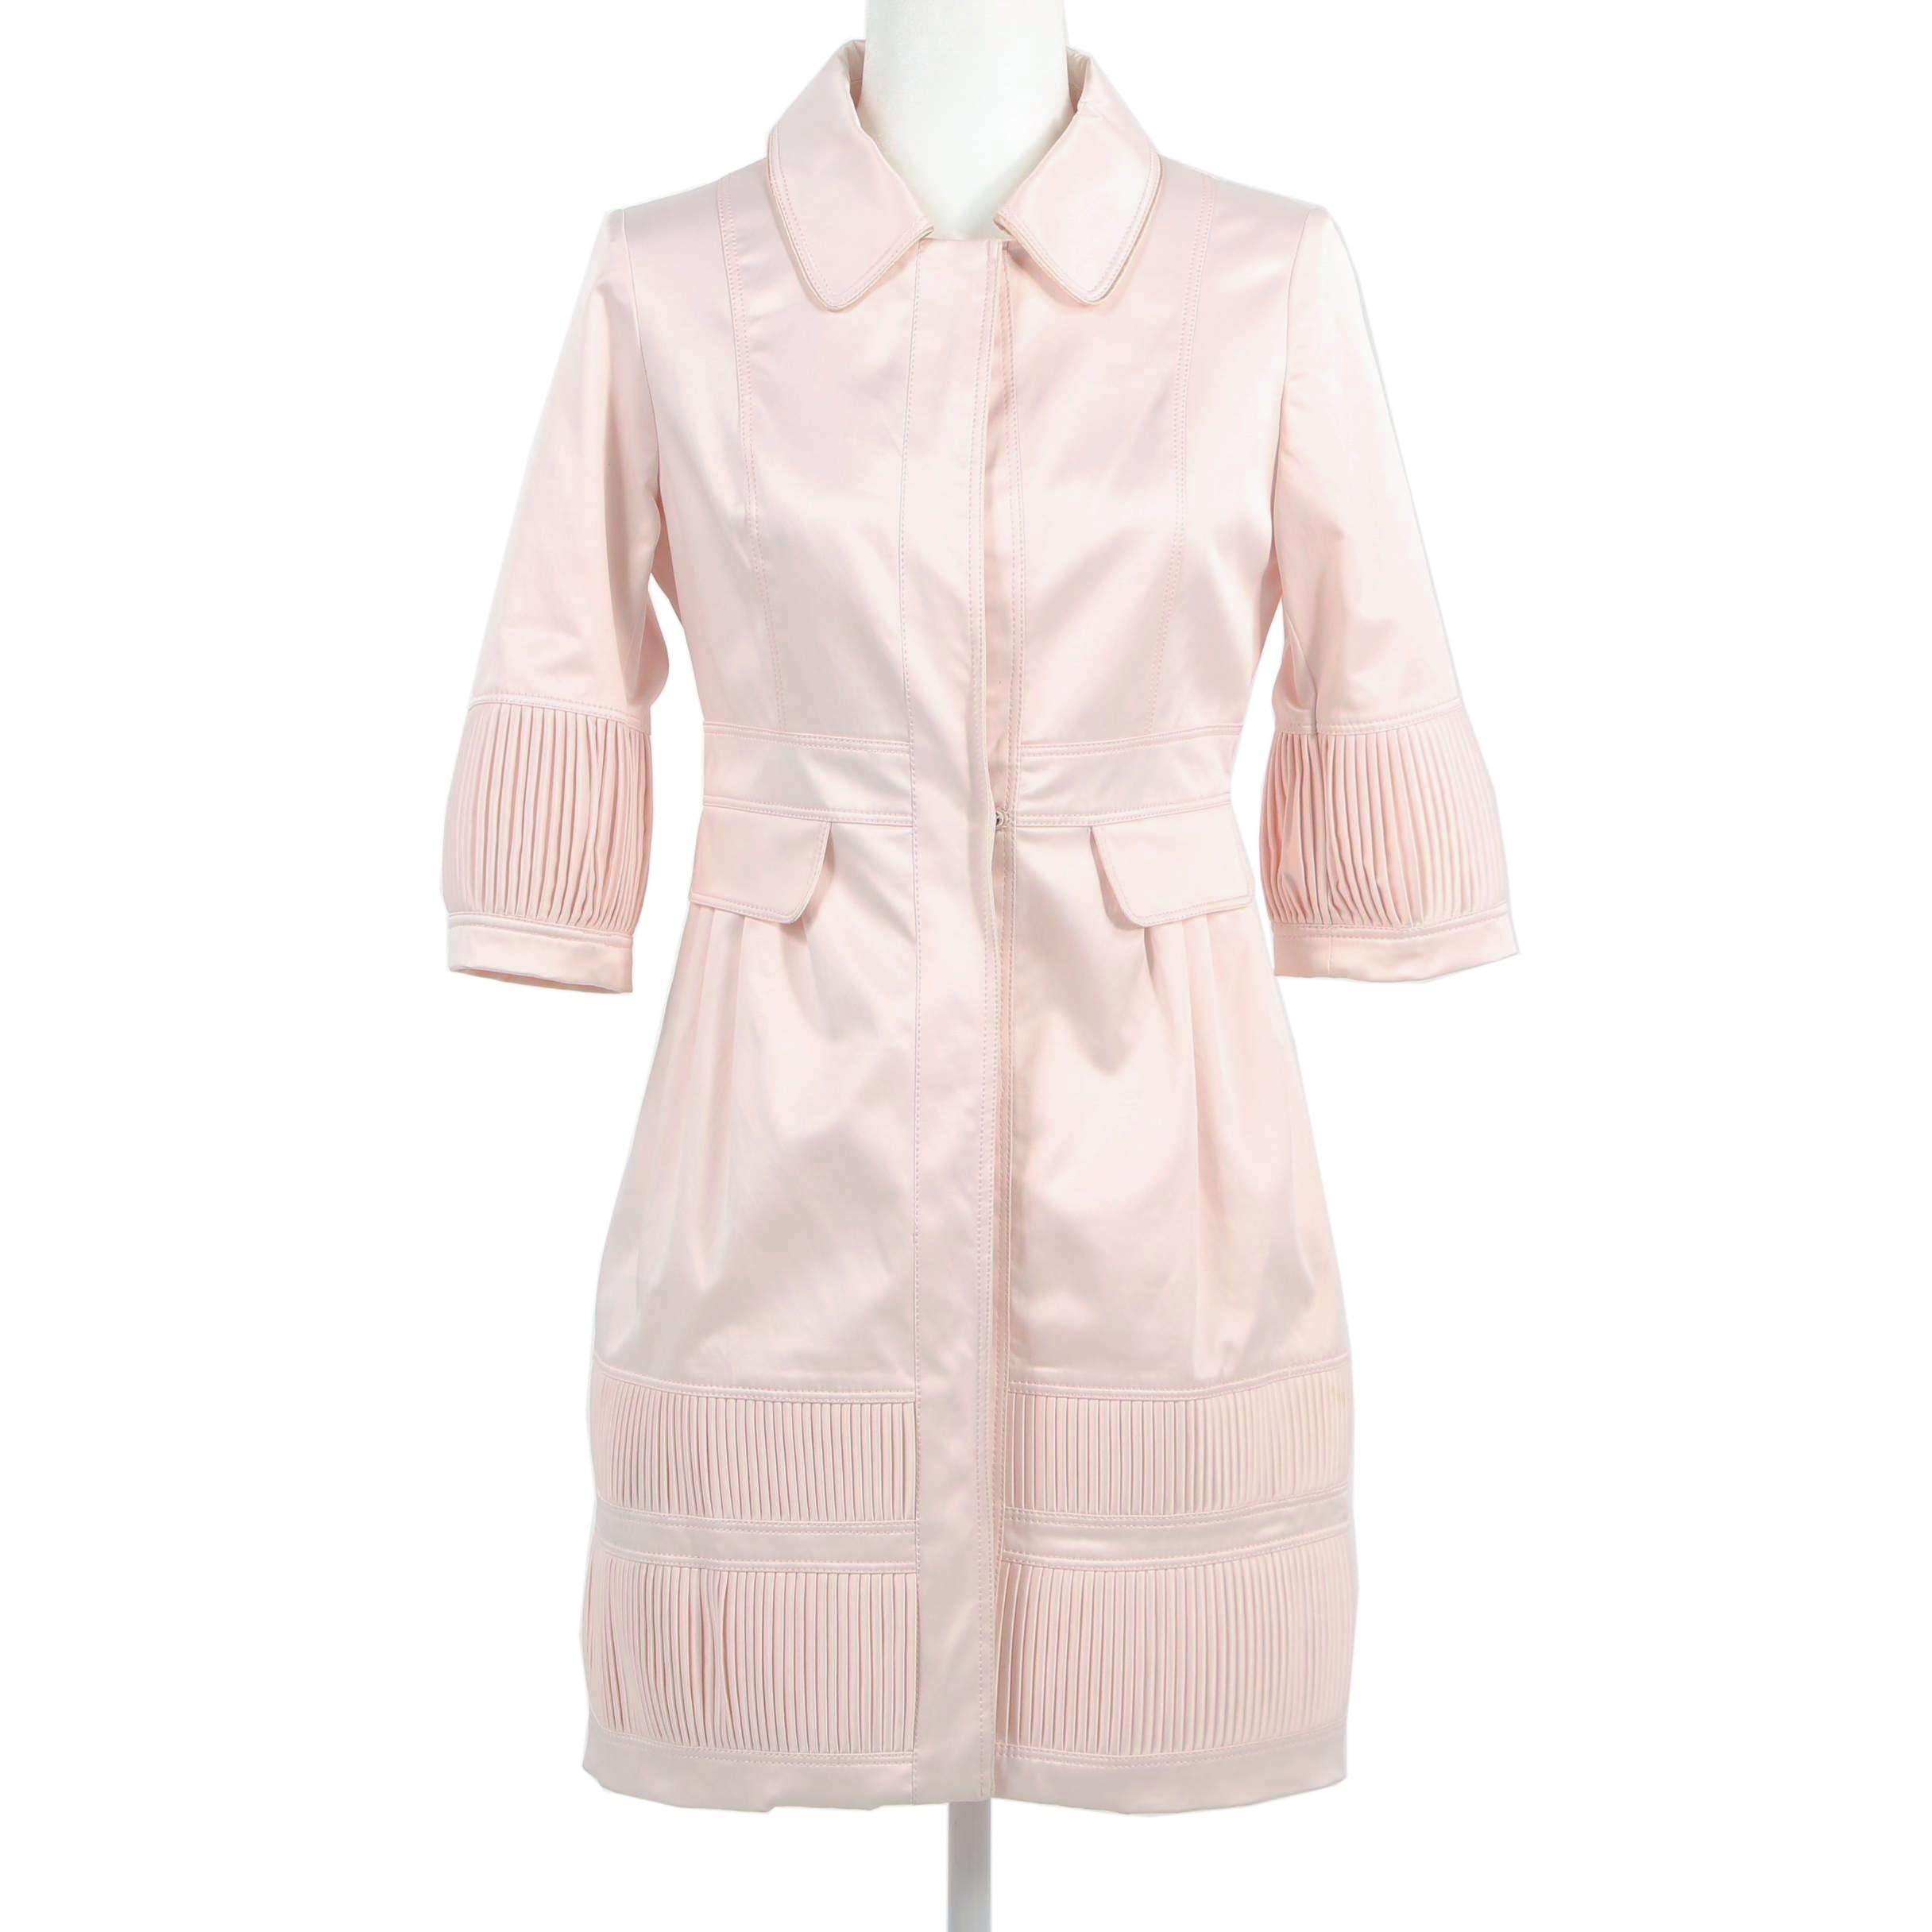 Alberta Ferretti Pink Cotton Half Sleeve Dress Coat